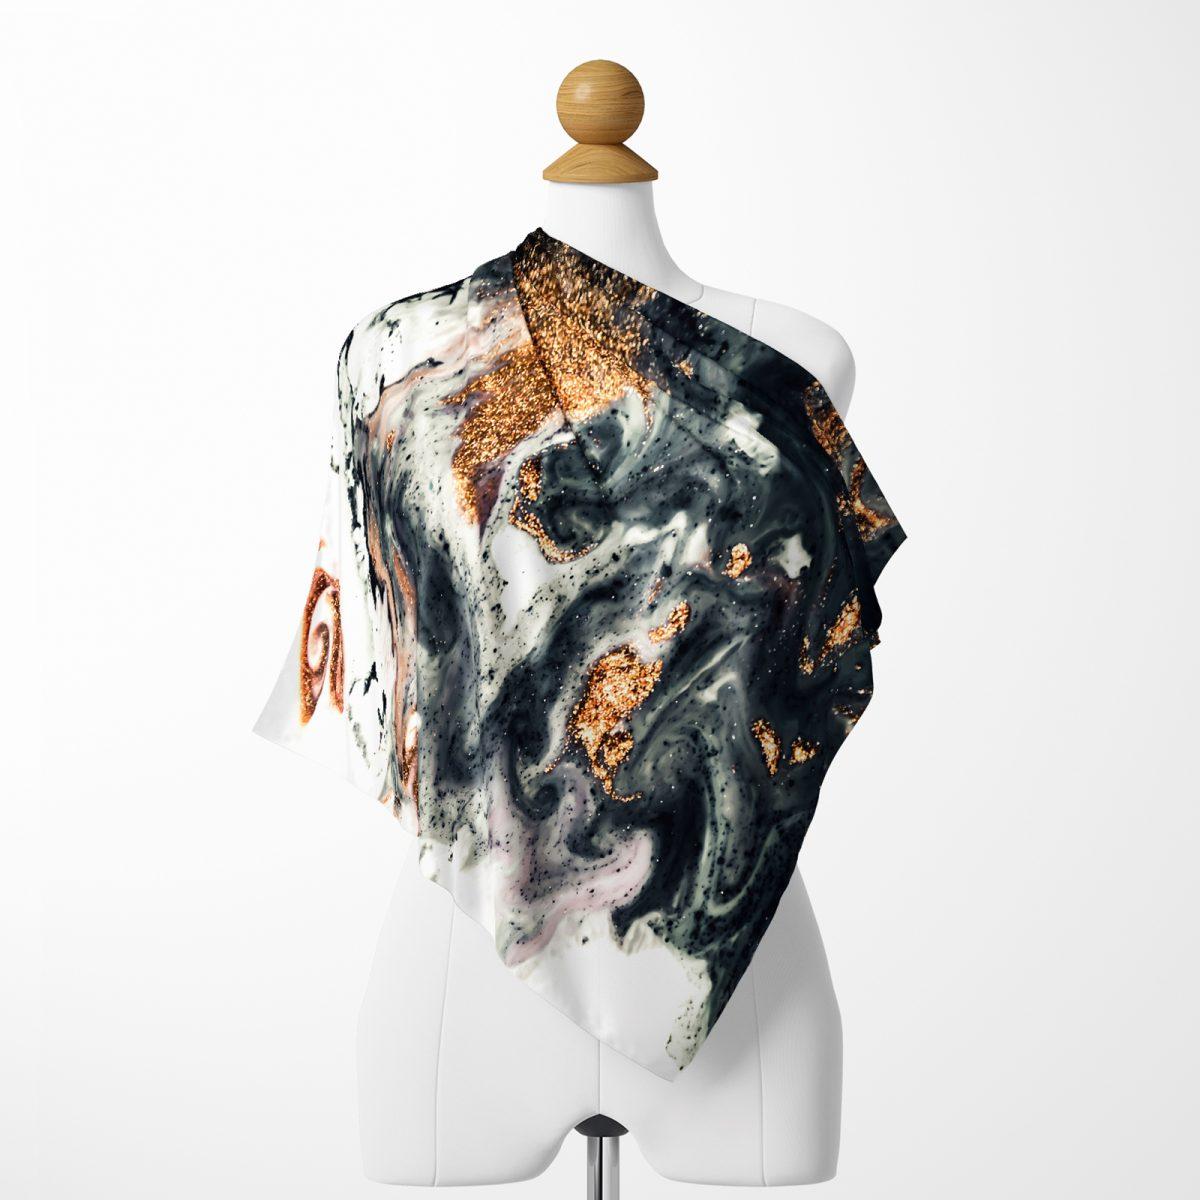 Realhomes Suluboya Desenli Dijital Baskılı Modern Tivil Eşarp Realhomes